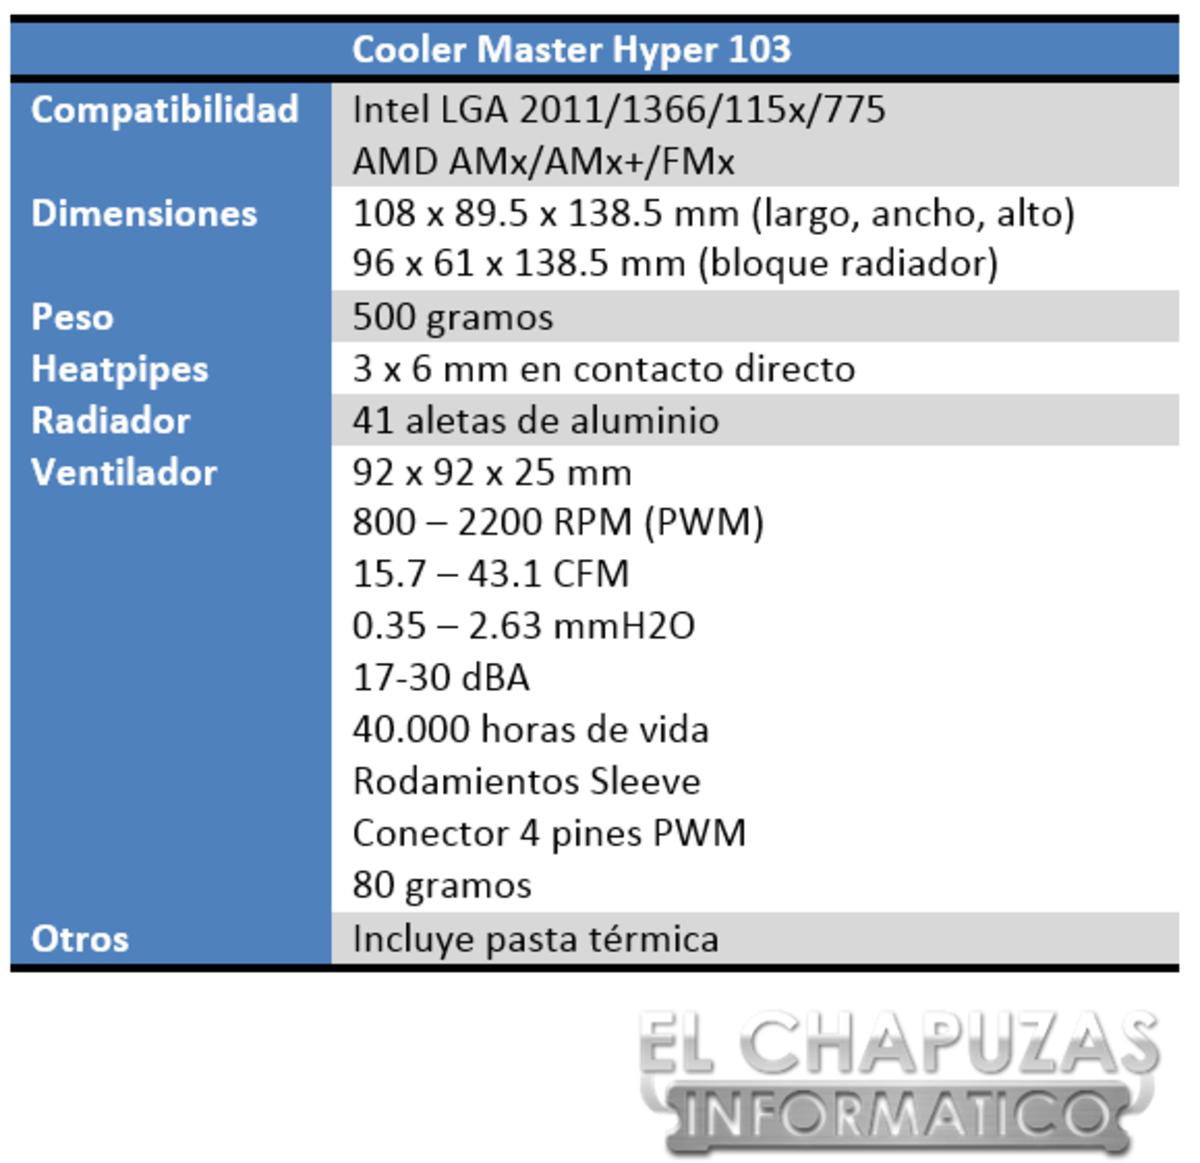 lchapuzasinformatico.com wp content uploads 2013 10 Cooler Master Hyper 103 Especificaciones 2